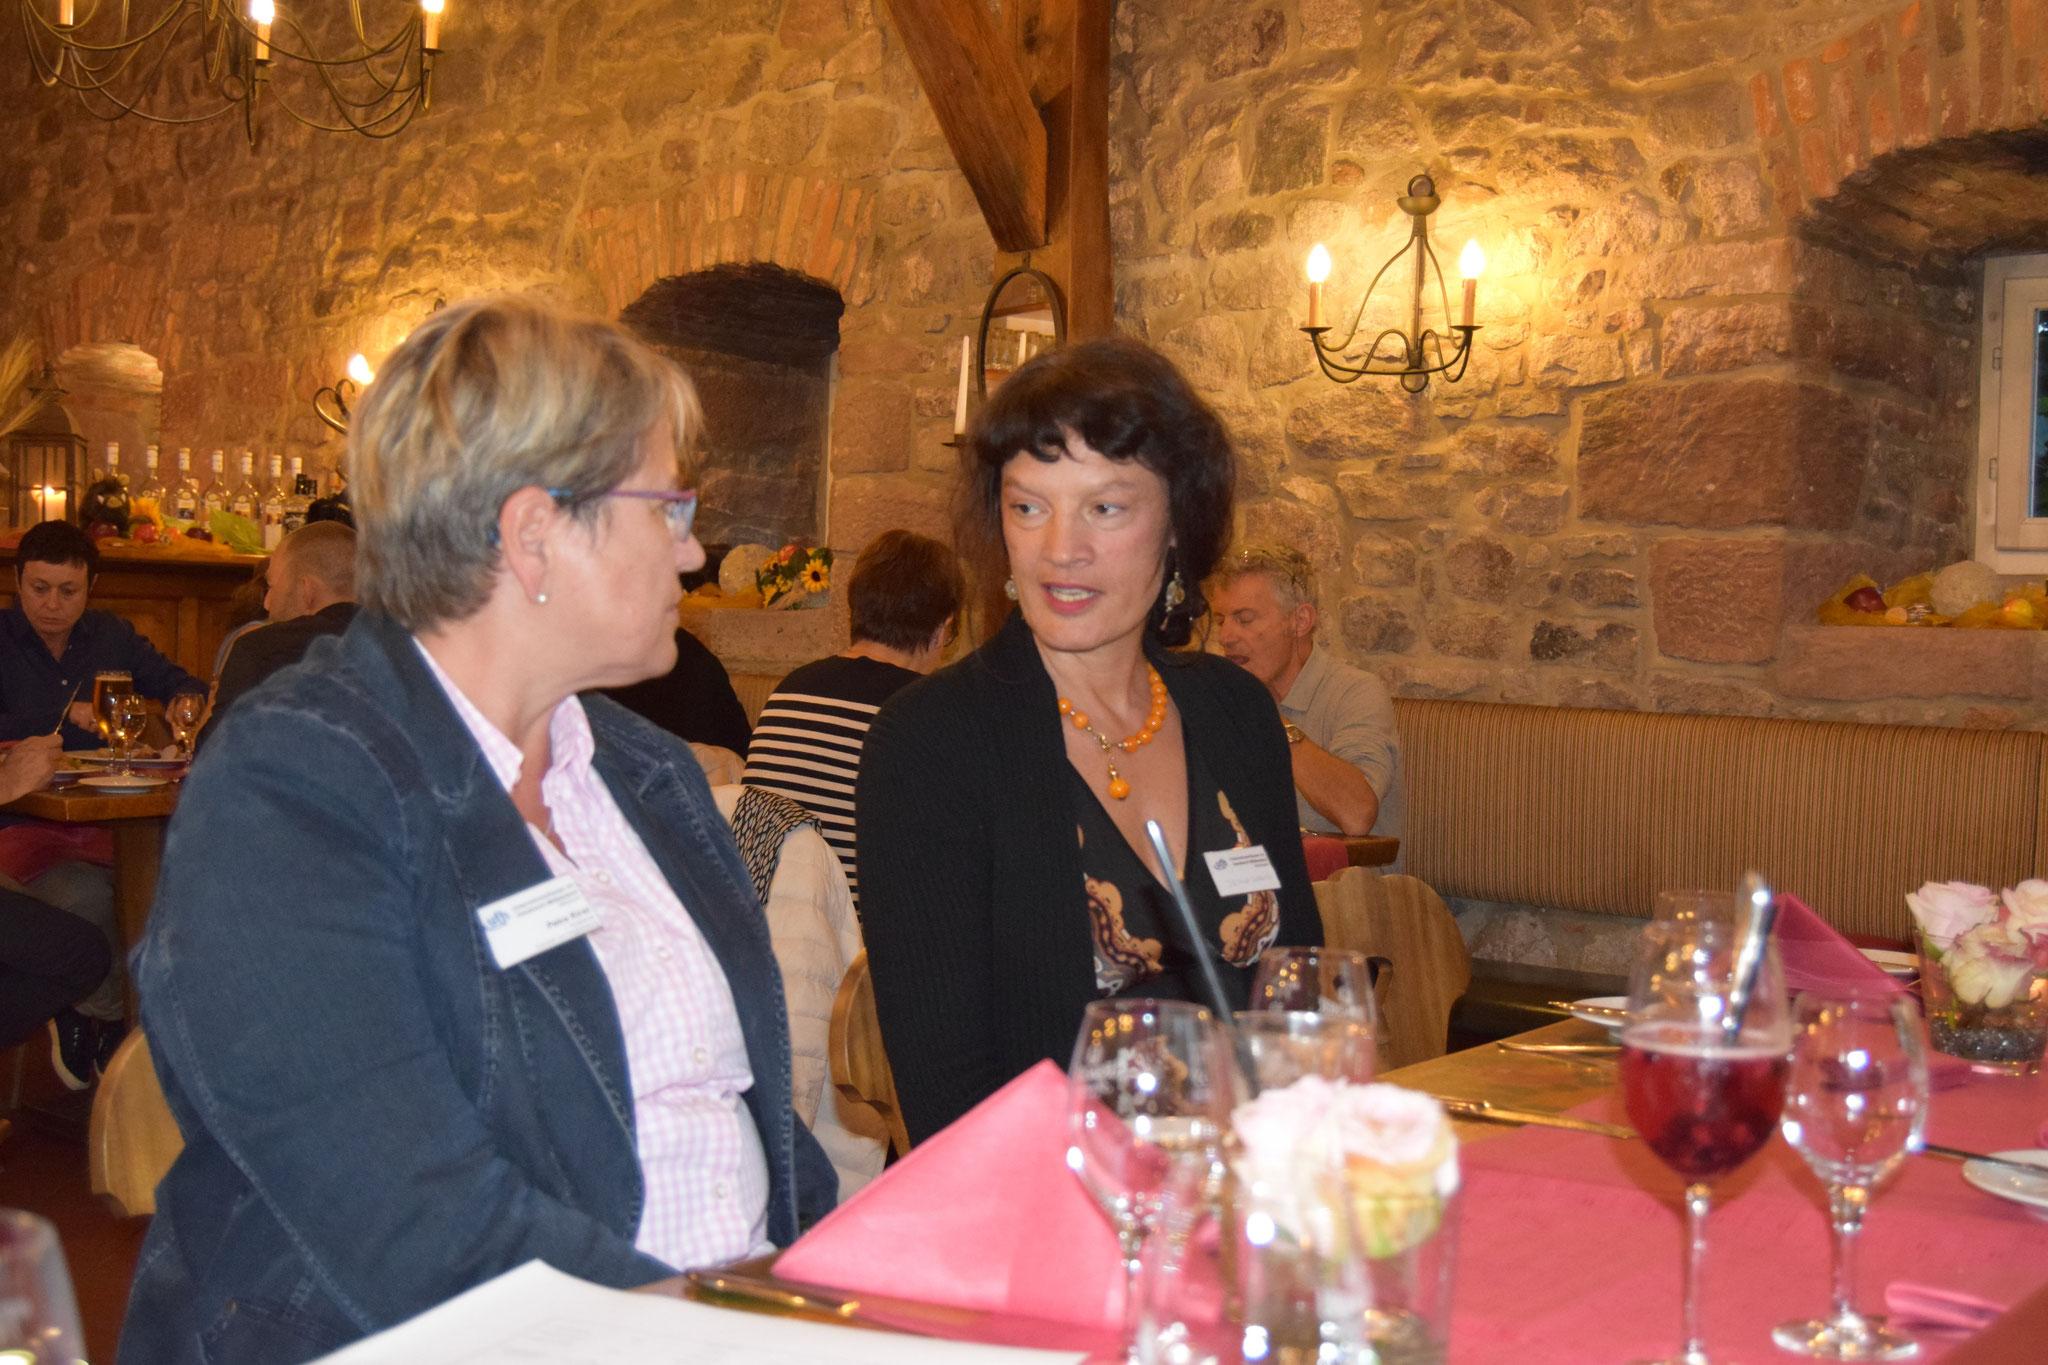 09-16 Frau Kirst begrüßt einen Gast